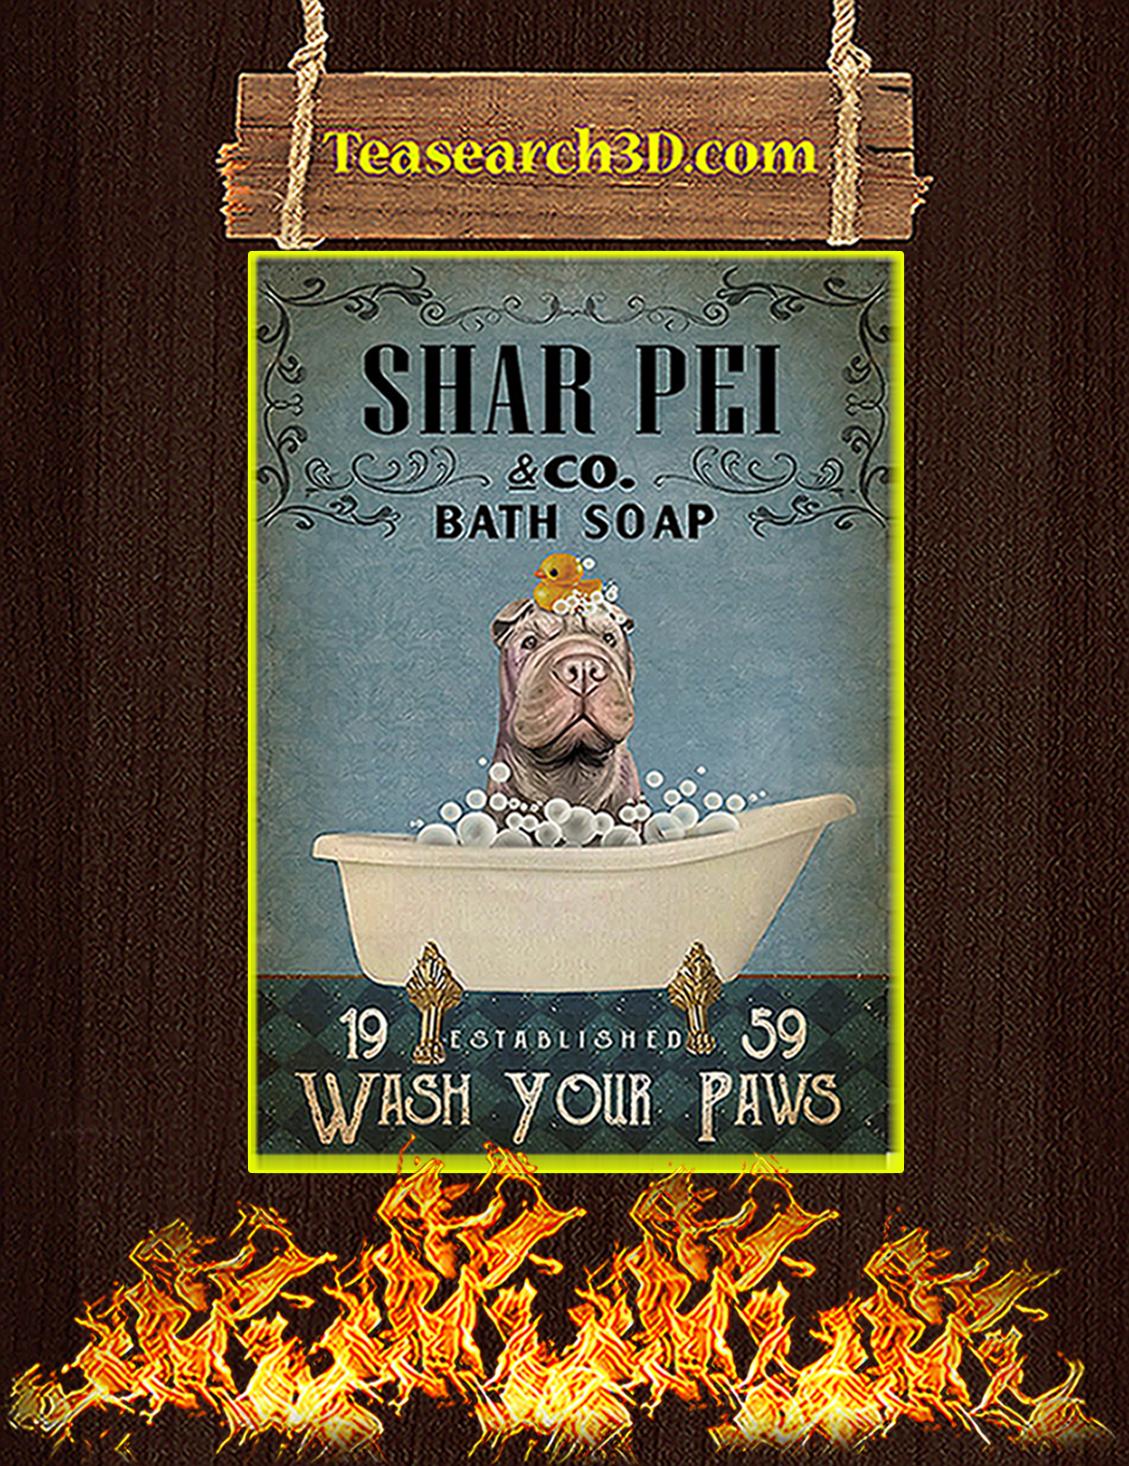 Bath Soap Company Shar Pei Poster A3